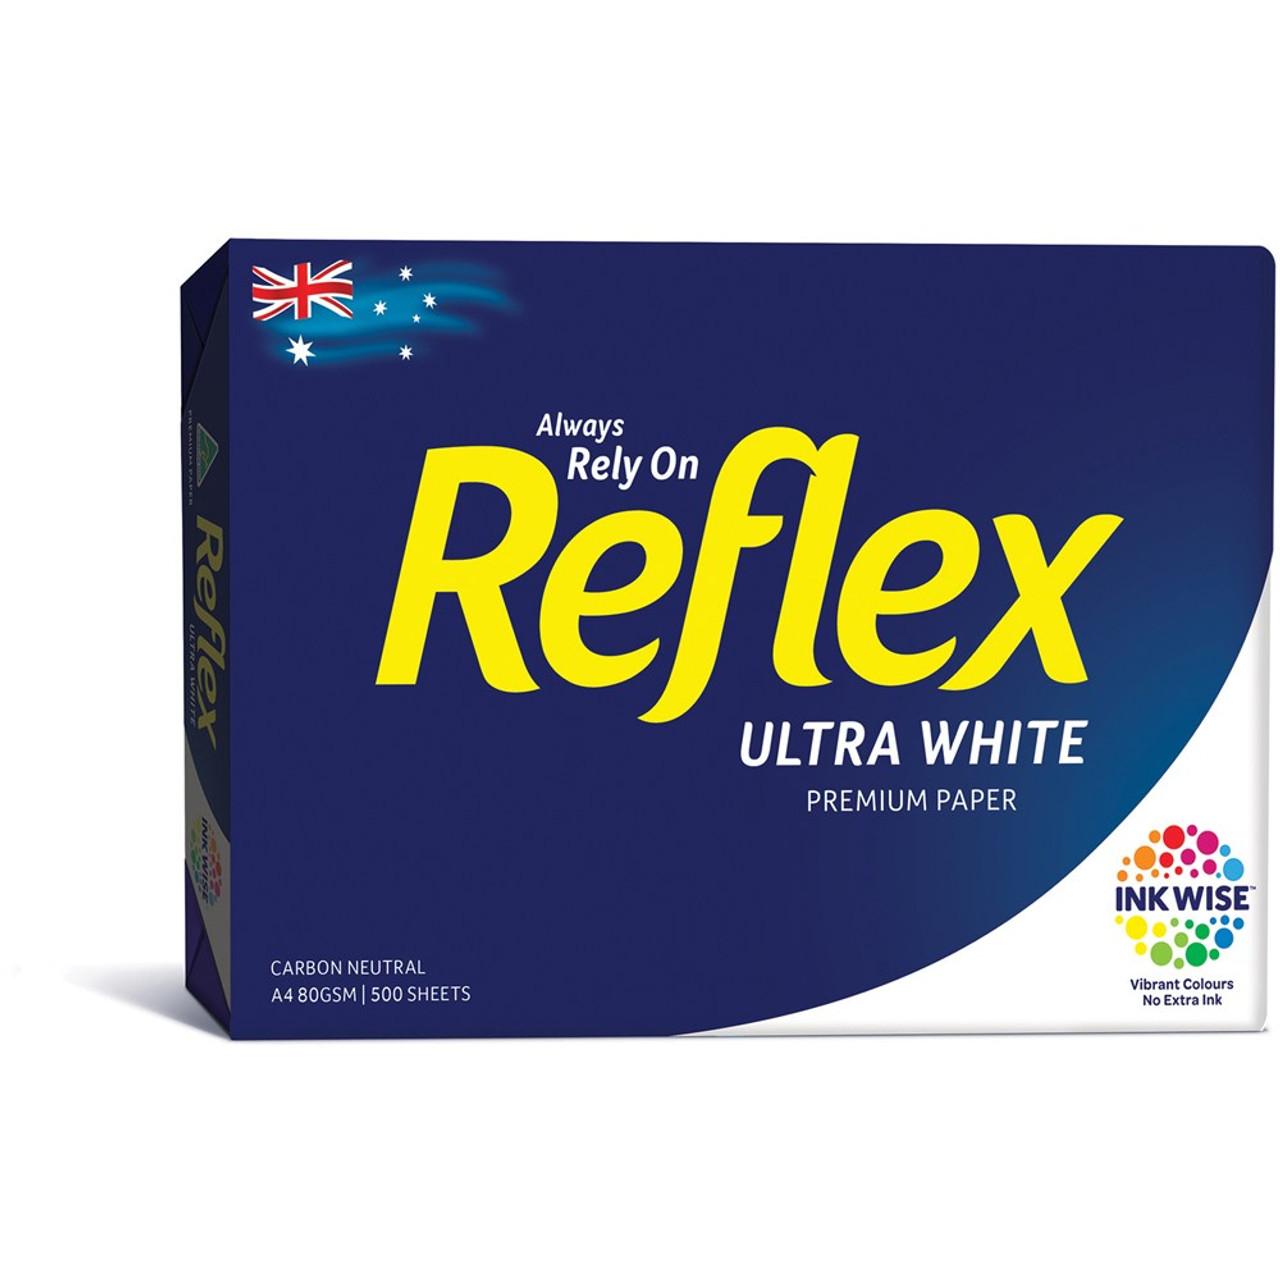 Reflex Pure White A4 80gsm Copy Paper 5 Reams 1 Carton 5 29 Including Gst Per Ream Nuprint Office Choice